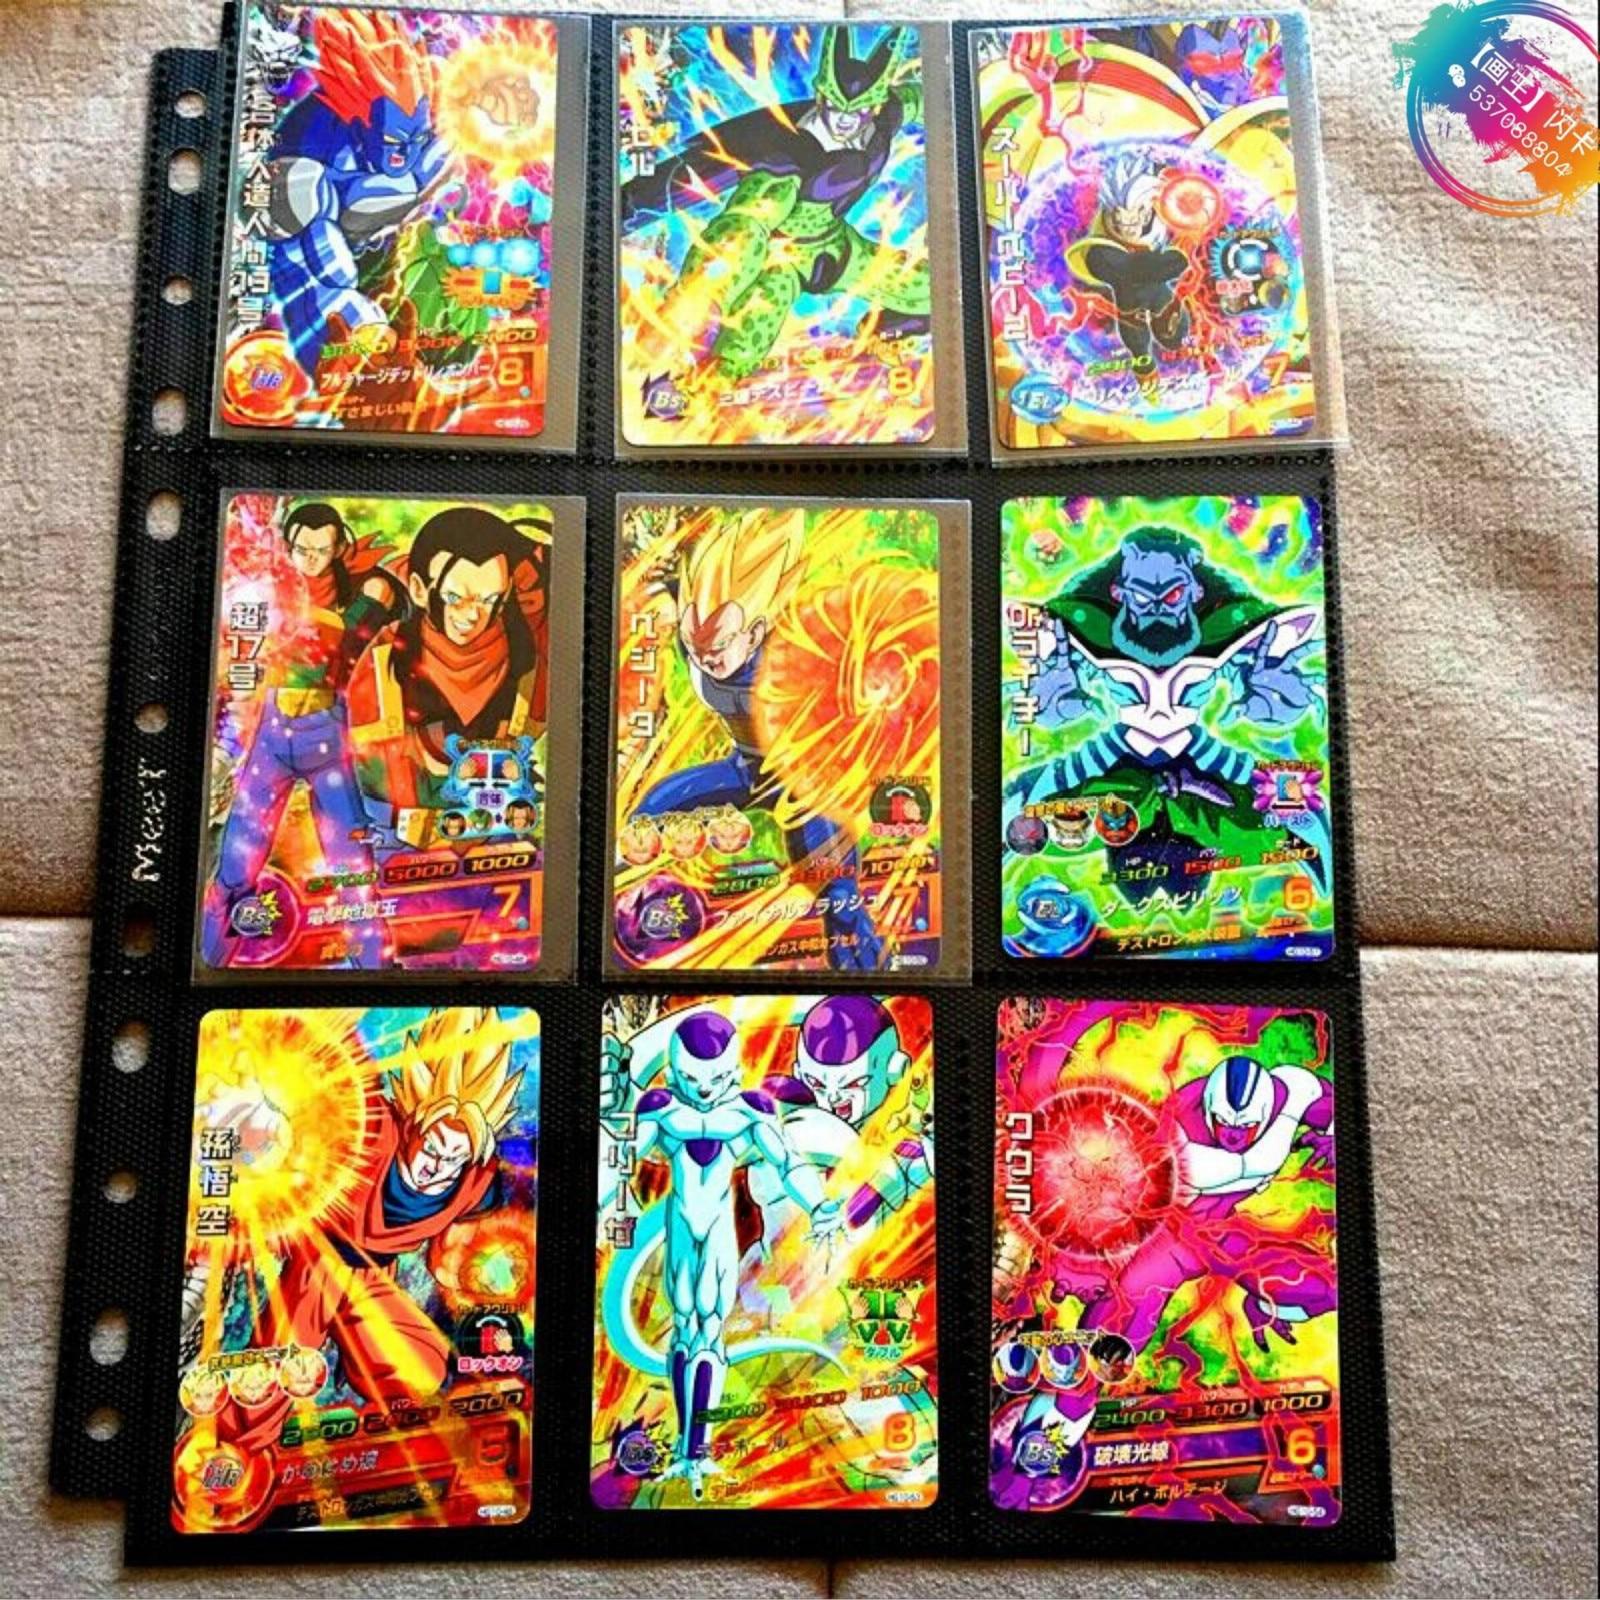 Japan Original Dragon Ball Hero Card SR Flash 3 Stars HG10 Goku Toys Hobbies Collectibles Game Collection Anime Cards